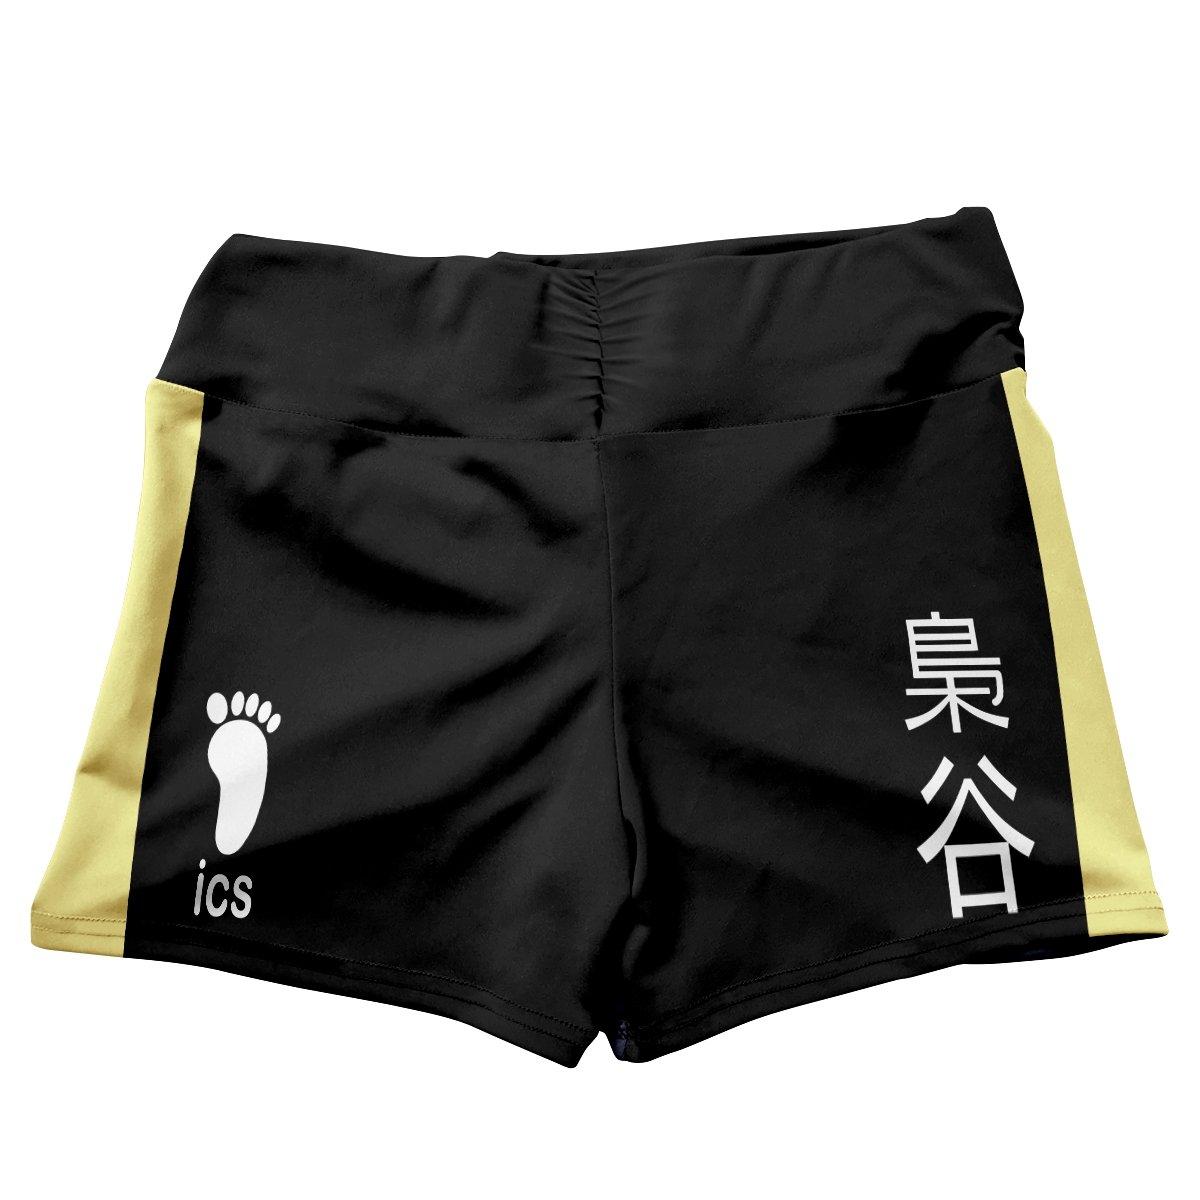 team fukurodani active wear set 720322 - Anime Swimsuits